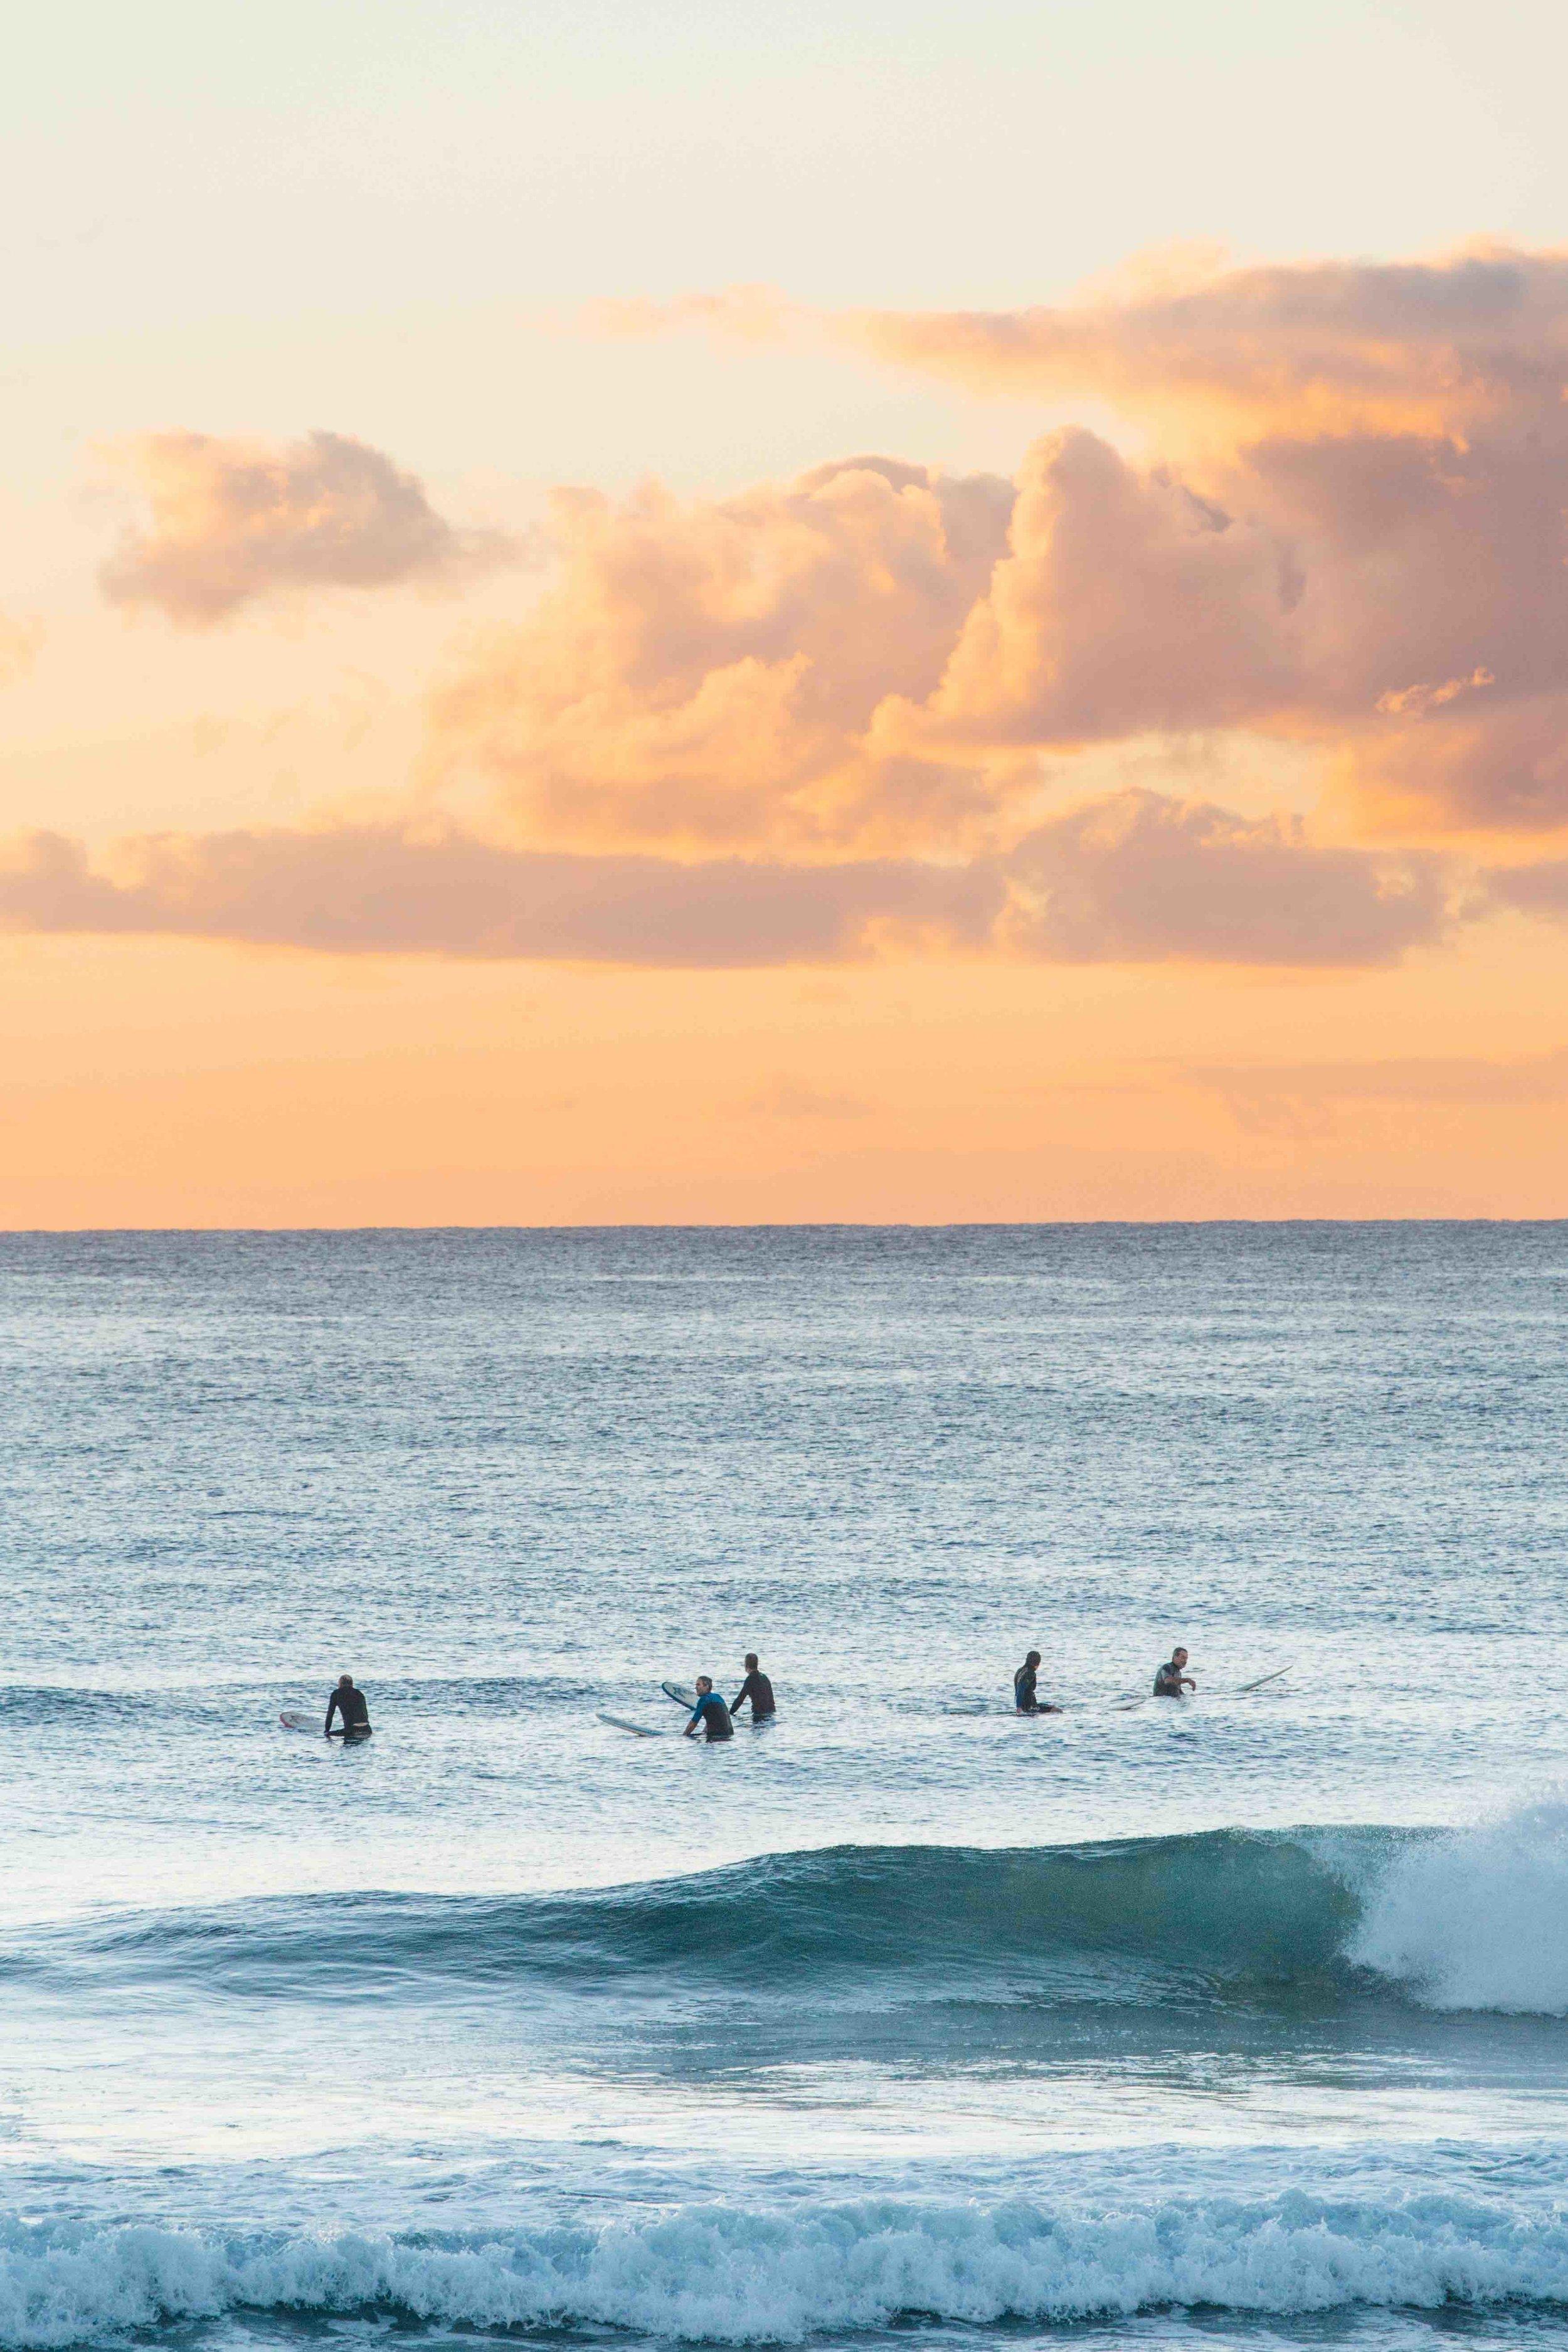 Sunrise surf in Manly Beach, Australia. Photo: Marine Raynard